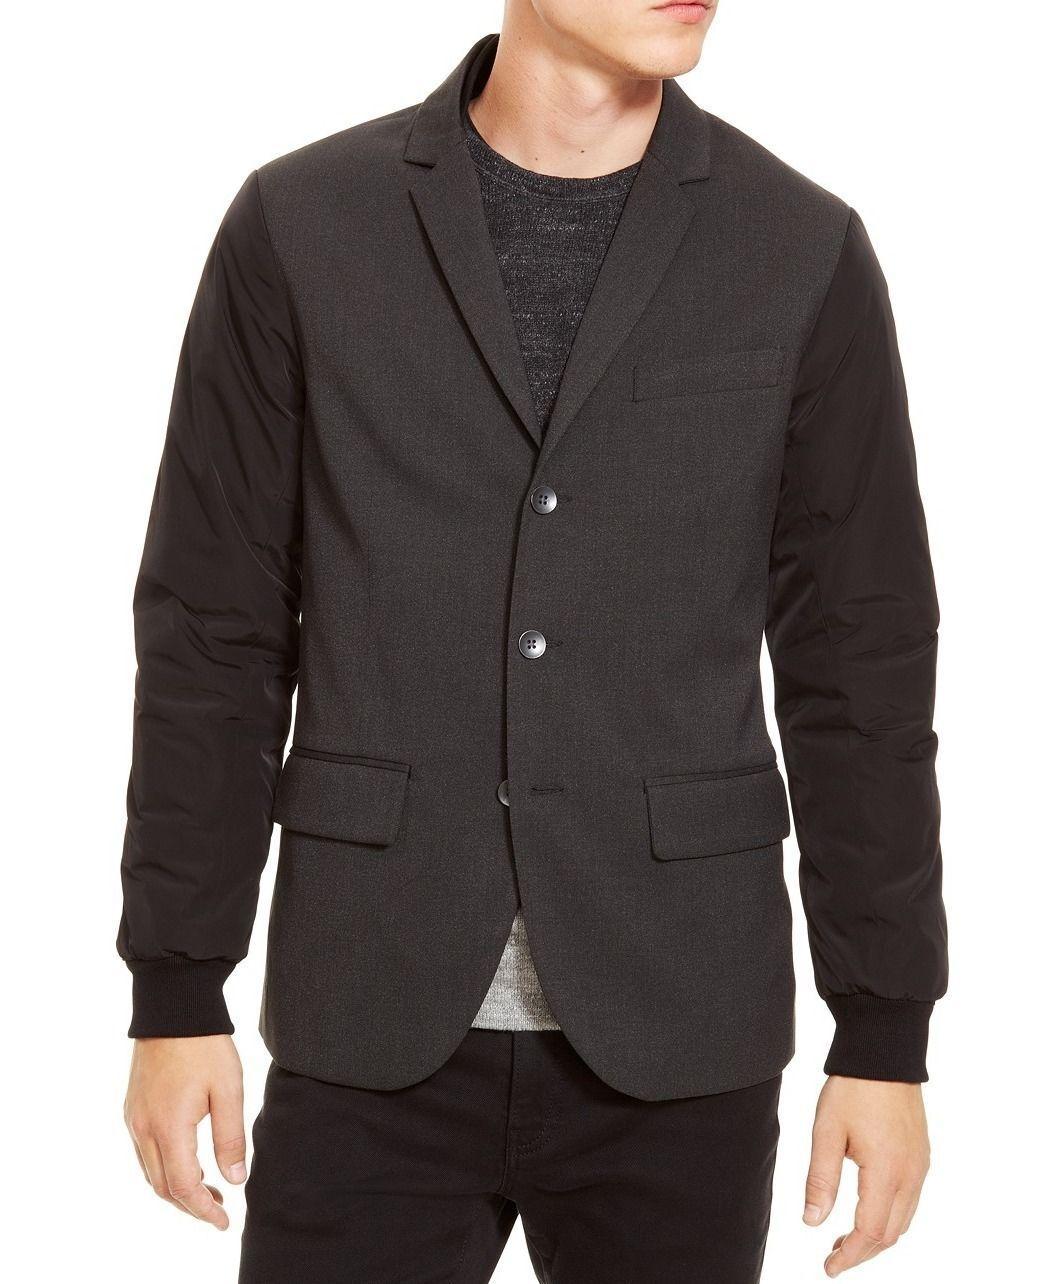 New Kenneth Cole Reaction Super Slim Fit Nylon Sleeve Blazer Sportcoat XL 47